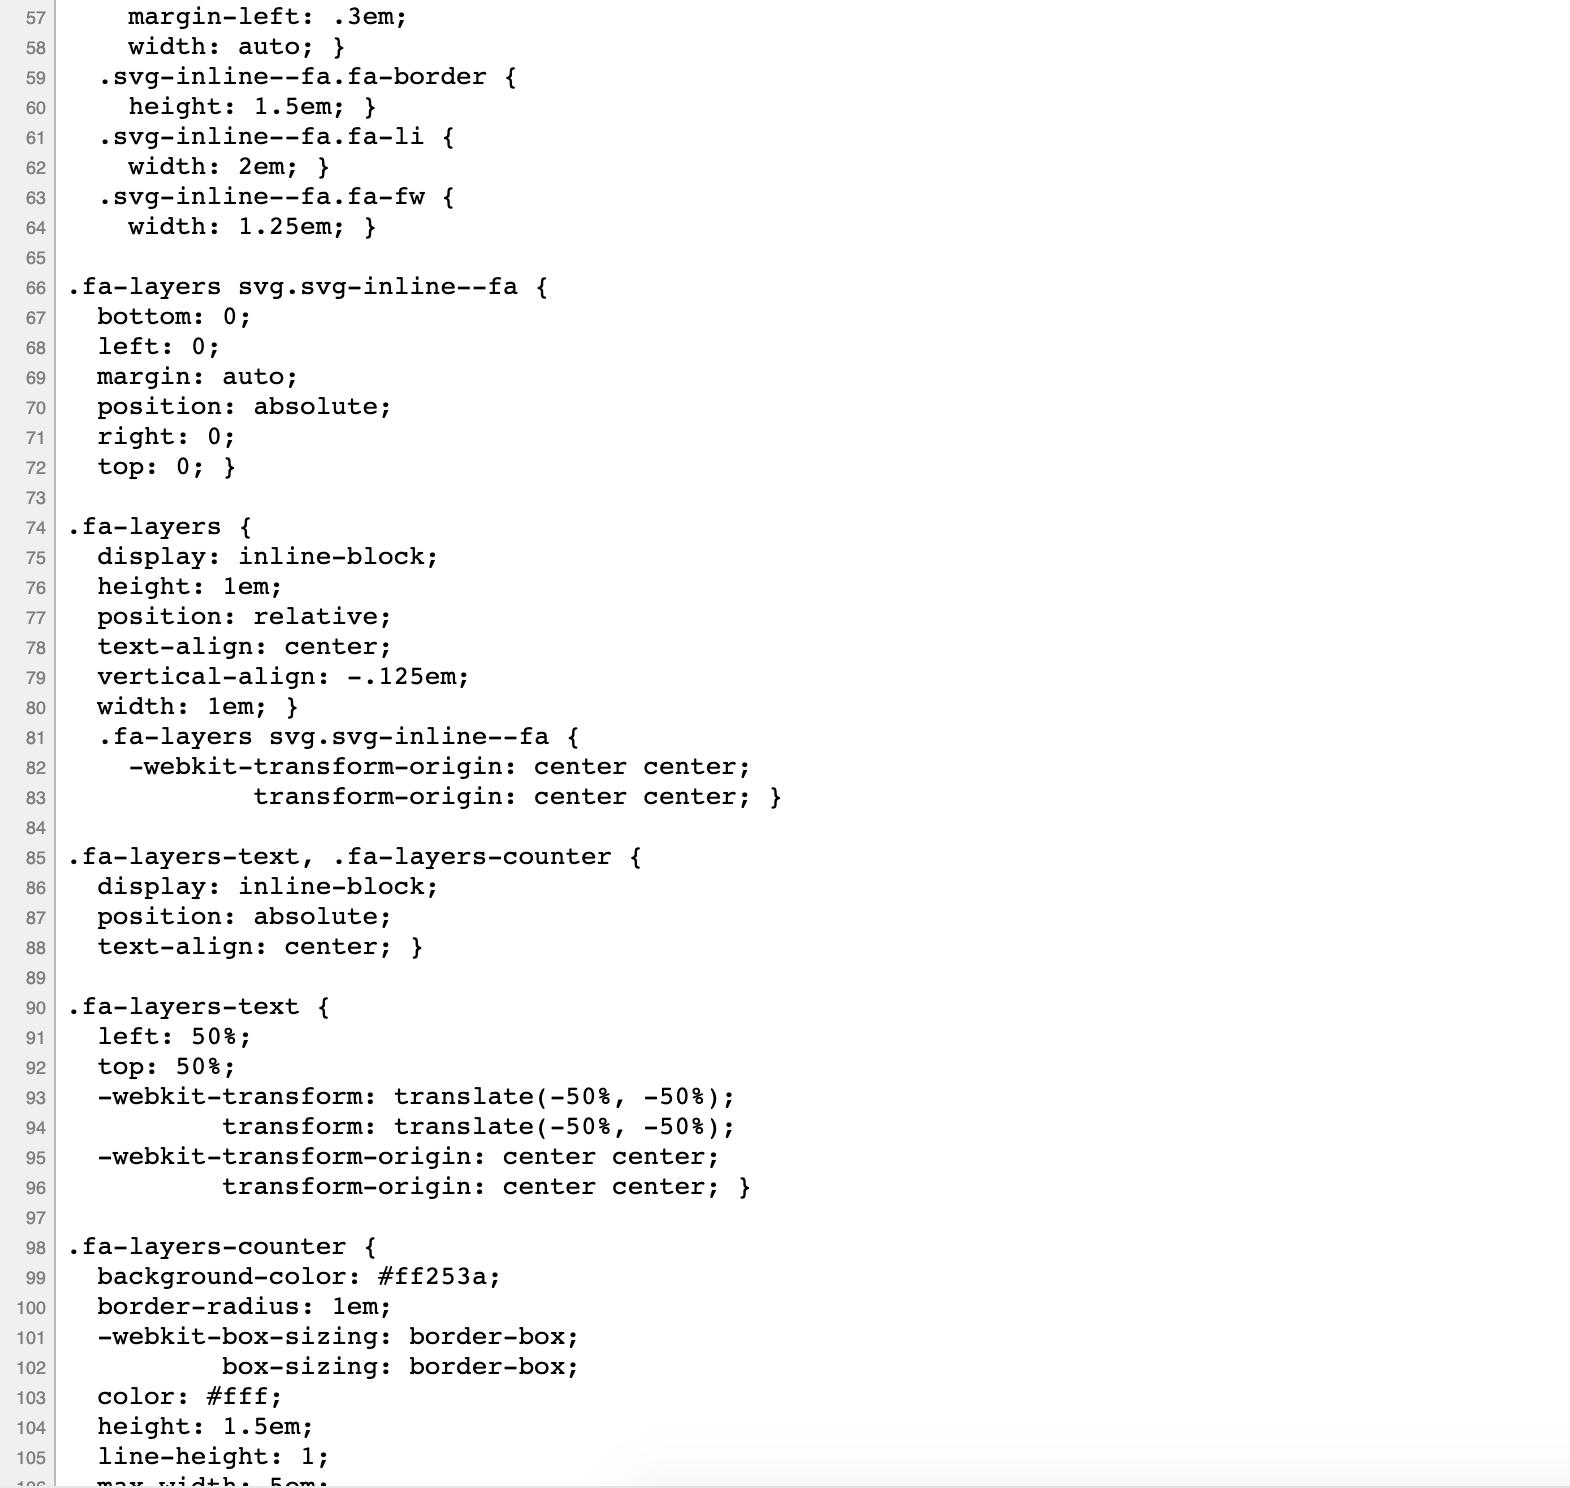 Screenshot-2021-08-10-at-8.37.47-PM